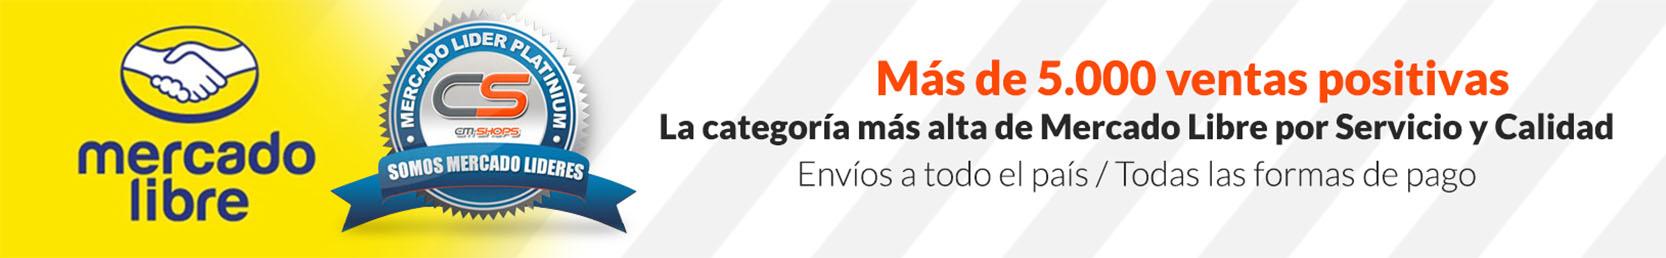 bannernosotros.jpg